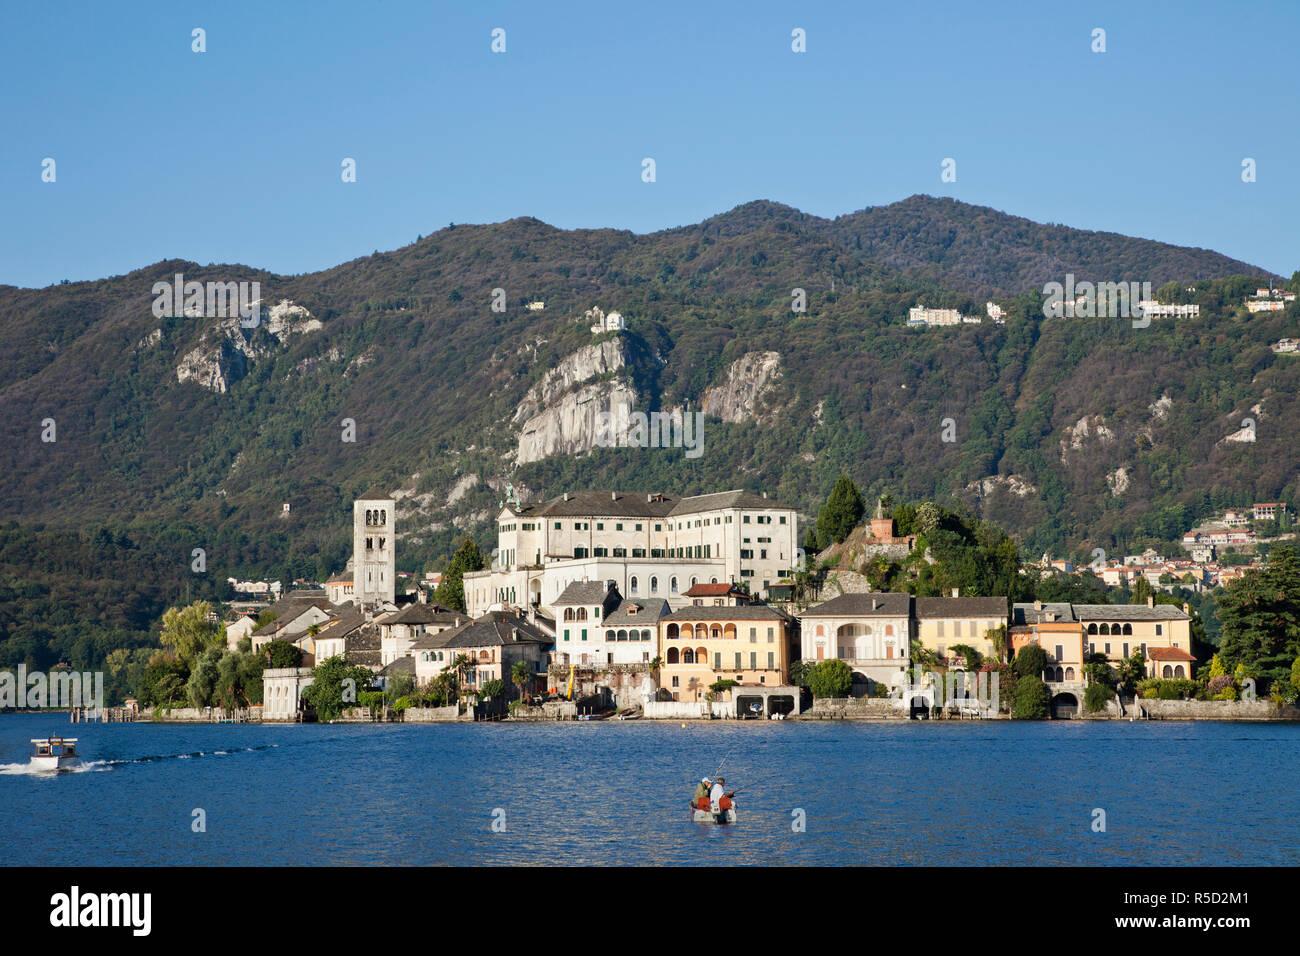 Italy, Piedmont, Lake Orta, San Giulio Island - Stock Image